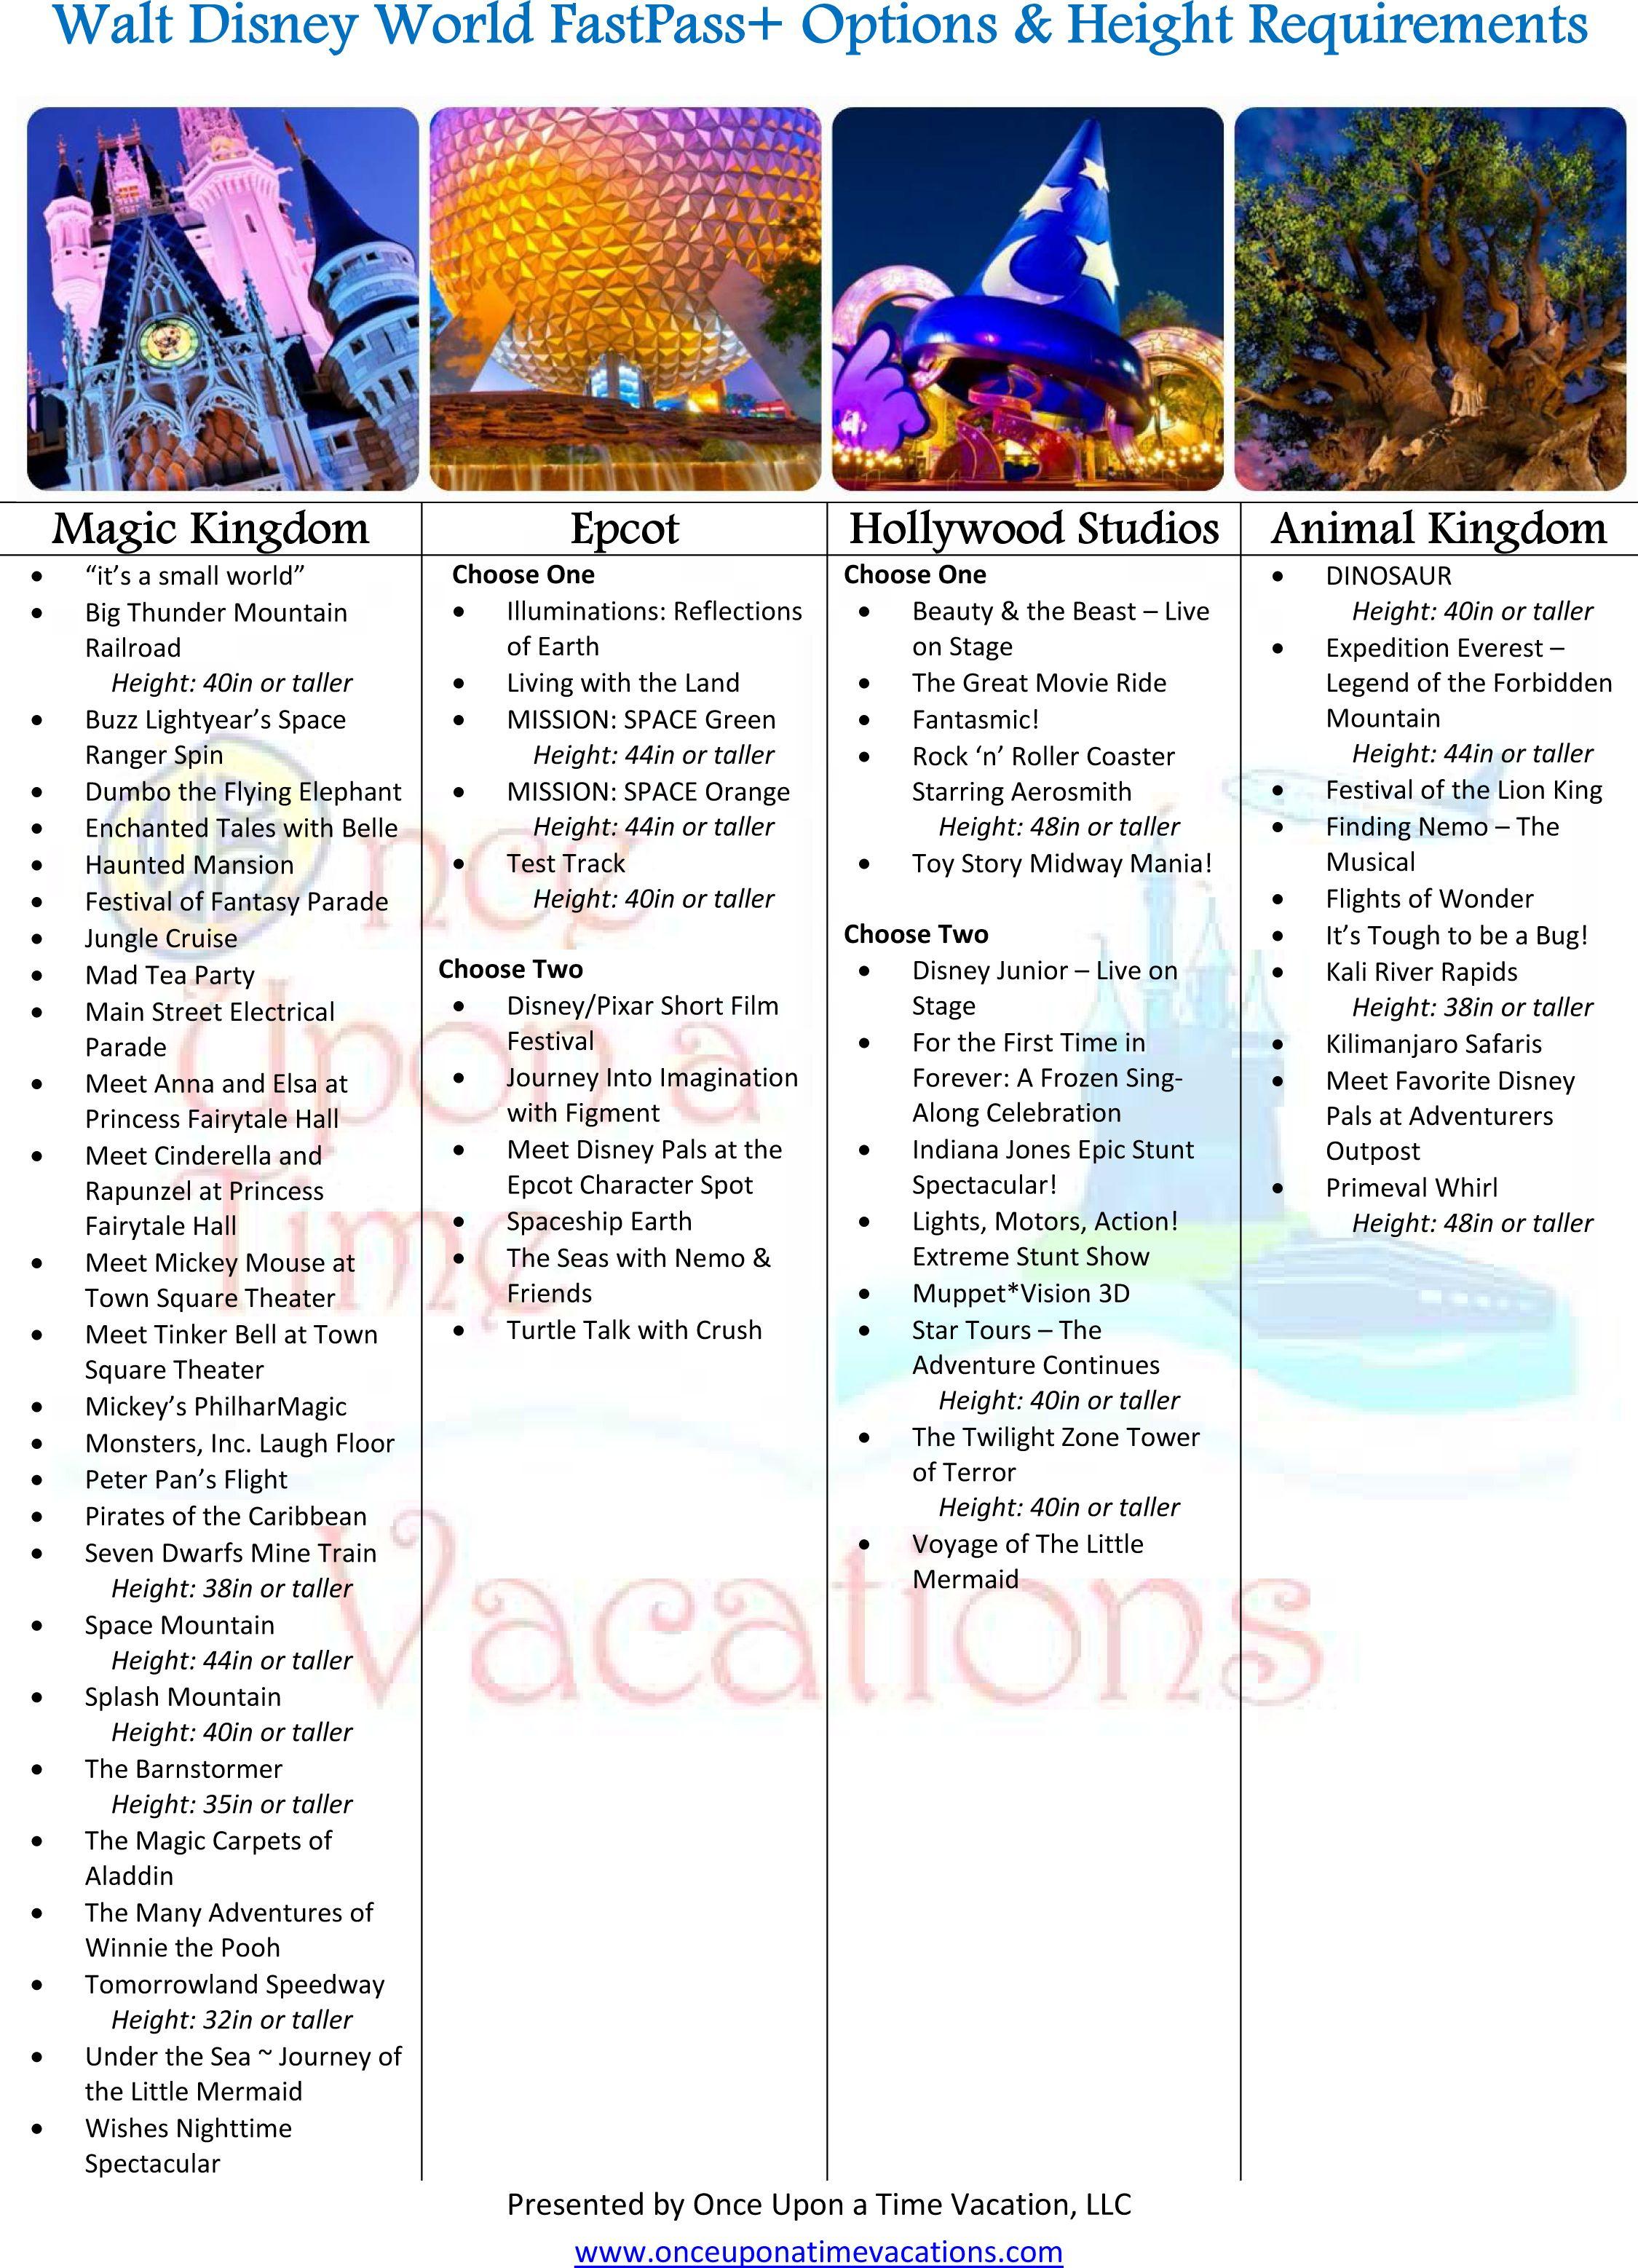 Pinheather Luce On Disney | Disney World Florida, Disney